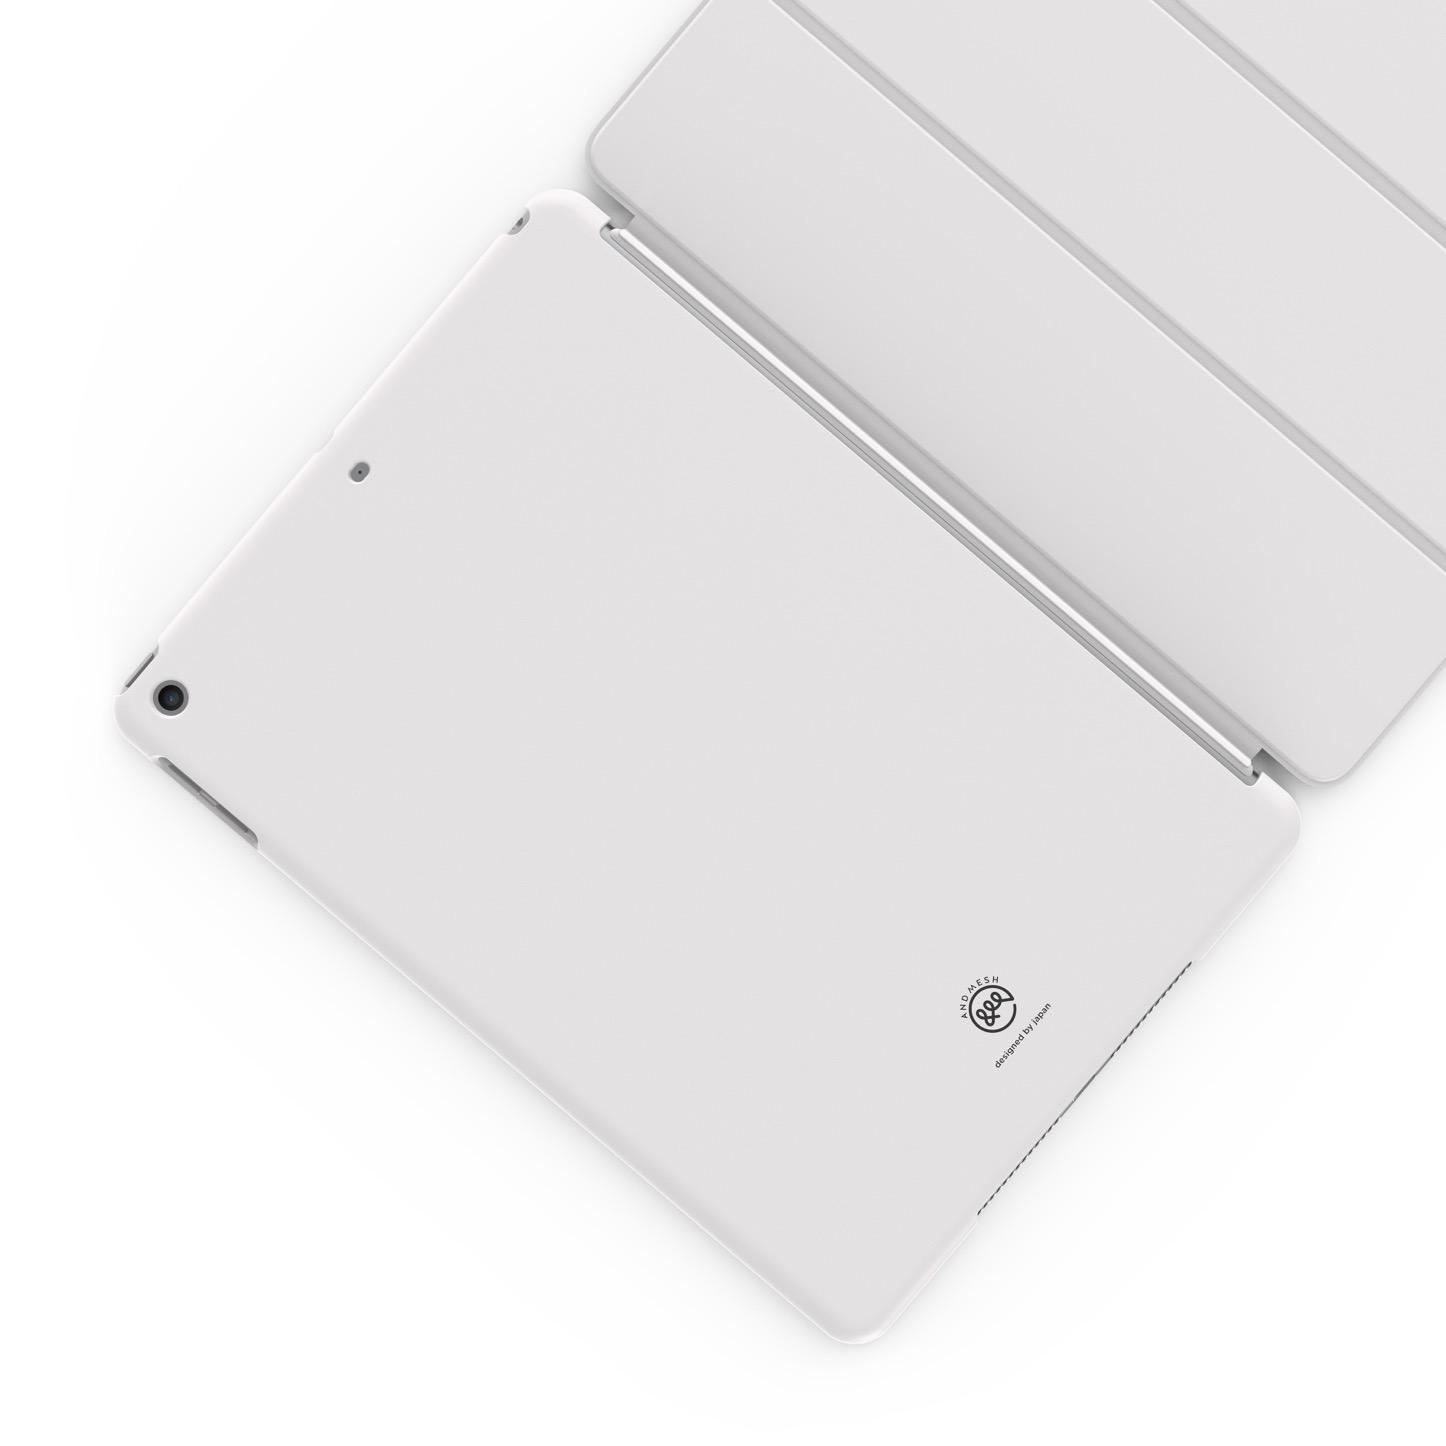 AndMesh-iPad-Pro-9_7-01.jpg